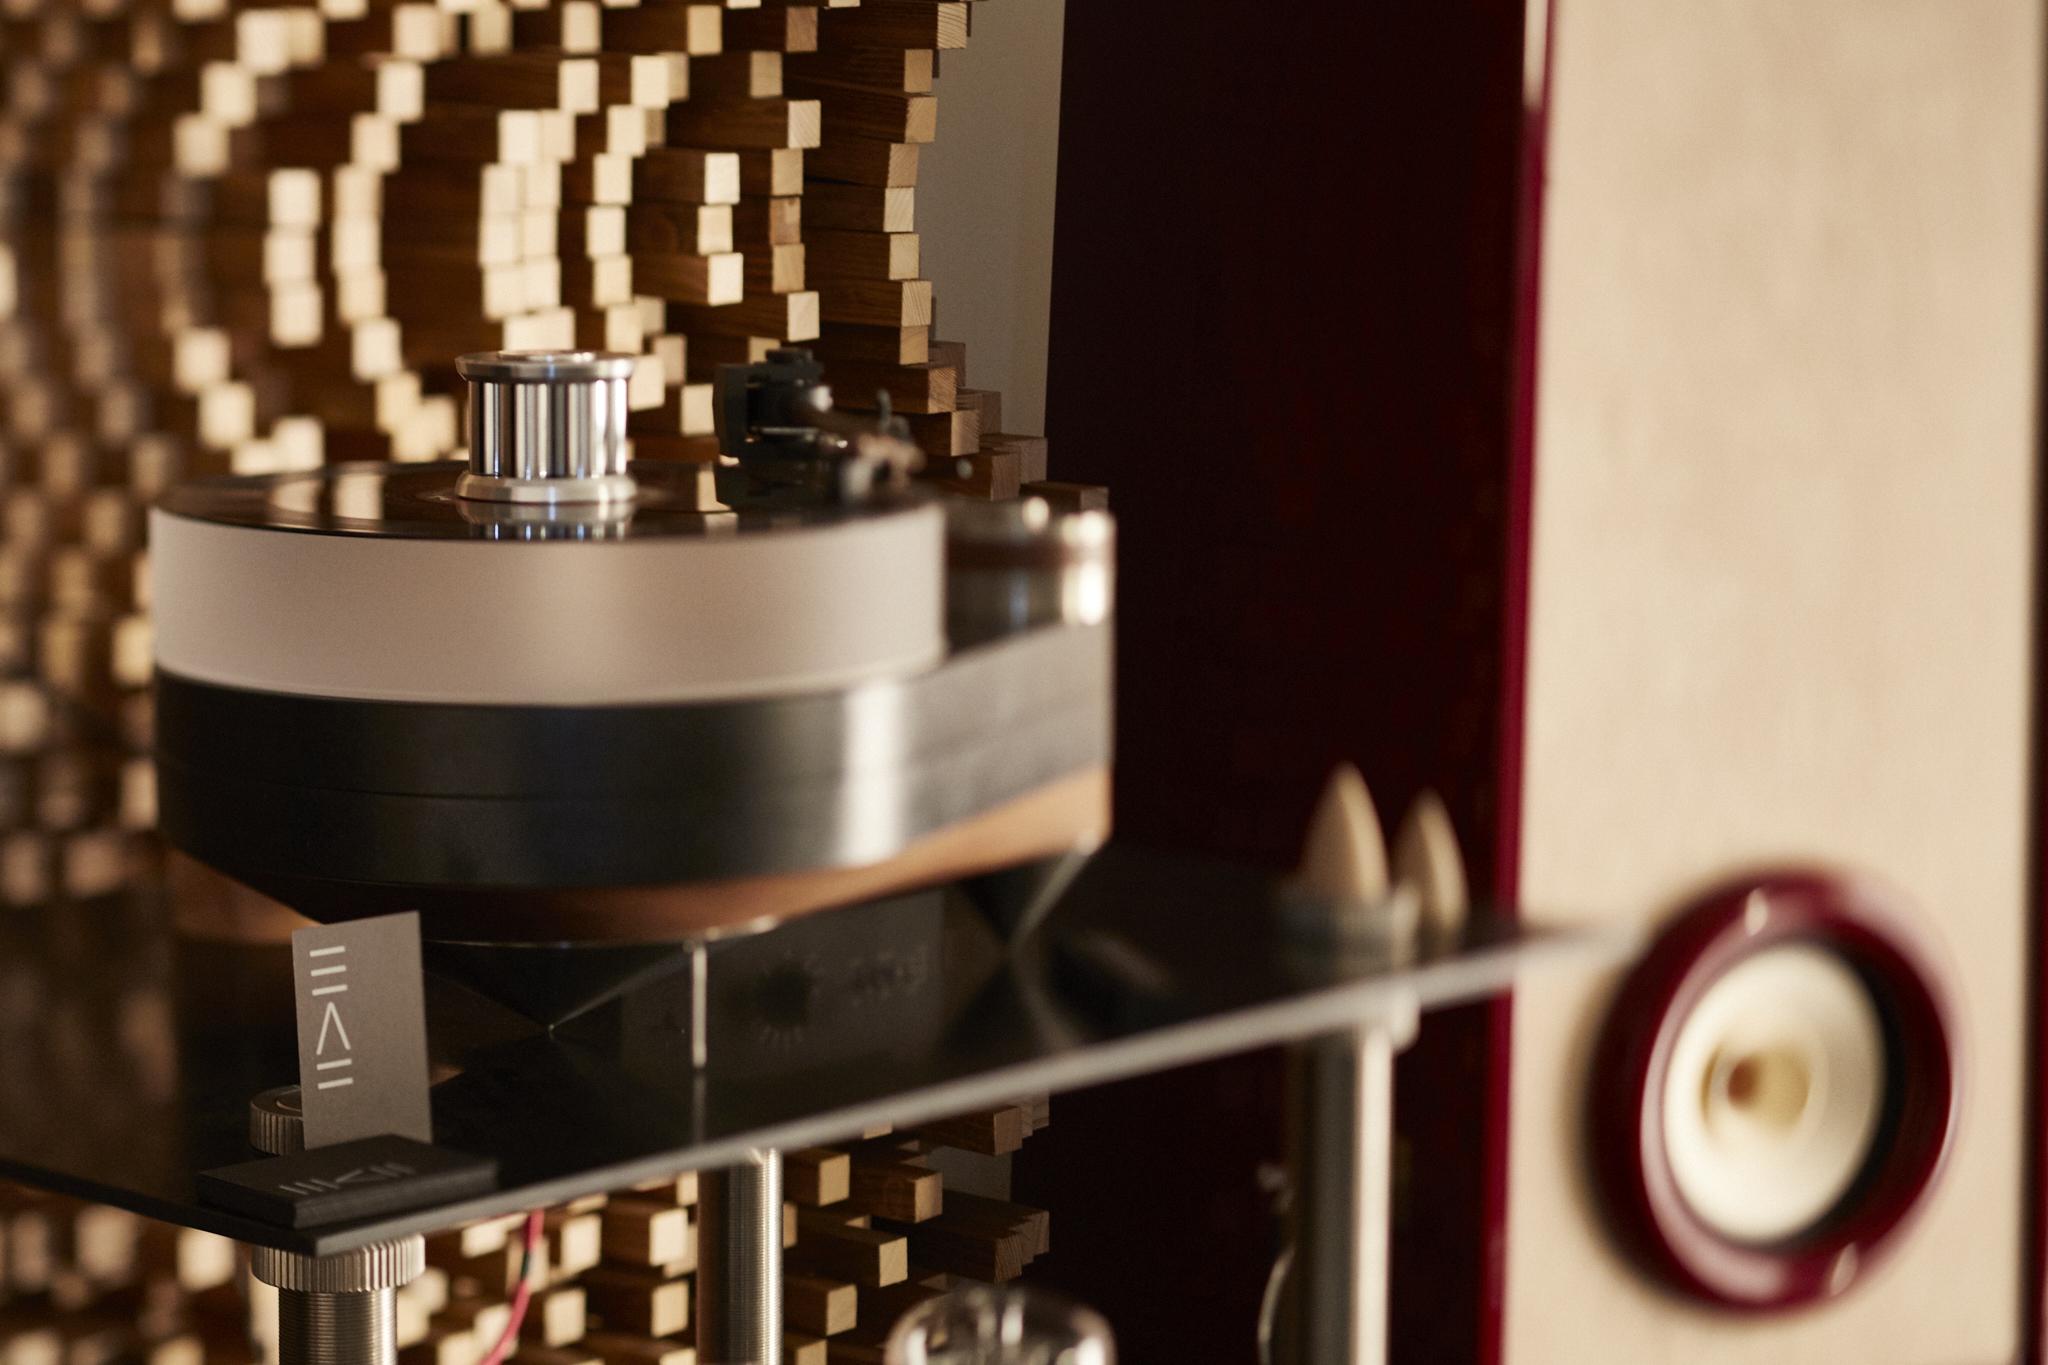 RDacoustic reproduktorové soustavy Evolution stereo 2.0, Kronzilla, 440 turntable High-End Mnichov 2016